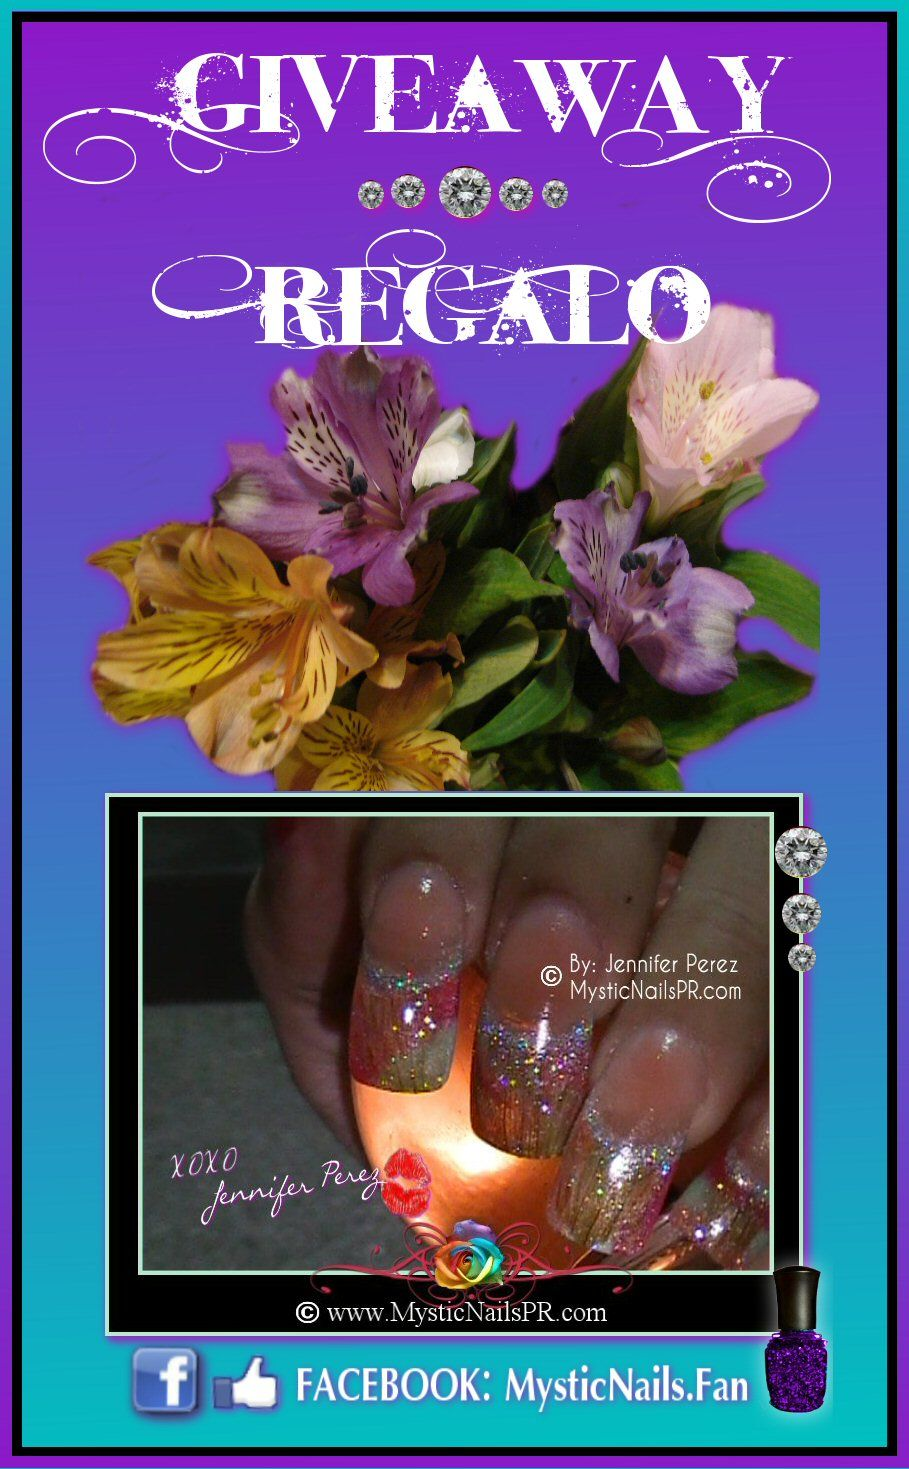 Hi ladies! FREE GIVEAWAY ~ Rules are on the Video, good luck. XOXO Jennifer {}♥{}{}{}♥{} ¡Hola chicas! REGALO - SORTEO GRATIS ~ Las reglas están disponibles en el video. ¡Suerte! XOXO Jennifer  MORE INFO ~ MAS INFO https://www.facebook.com/MysticNails.Fan